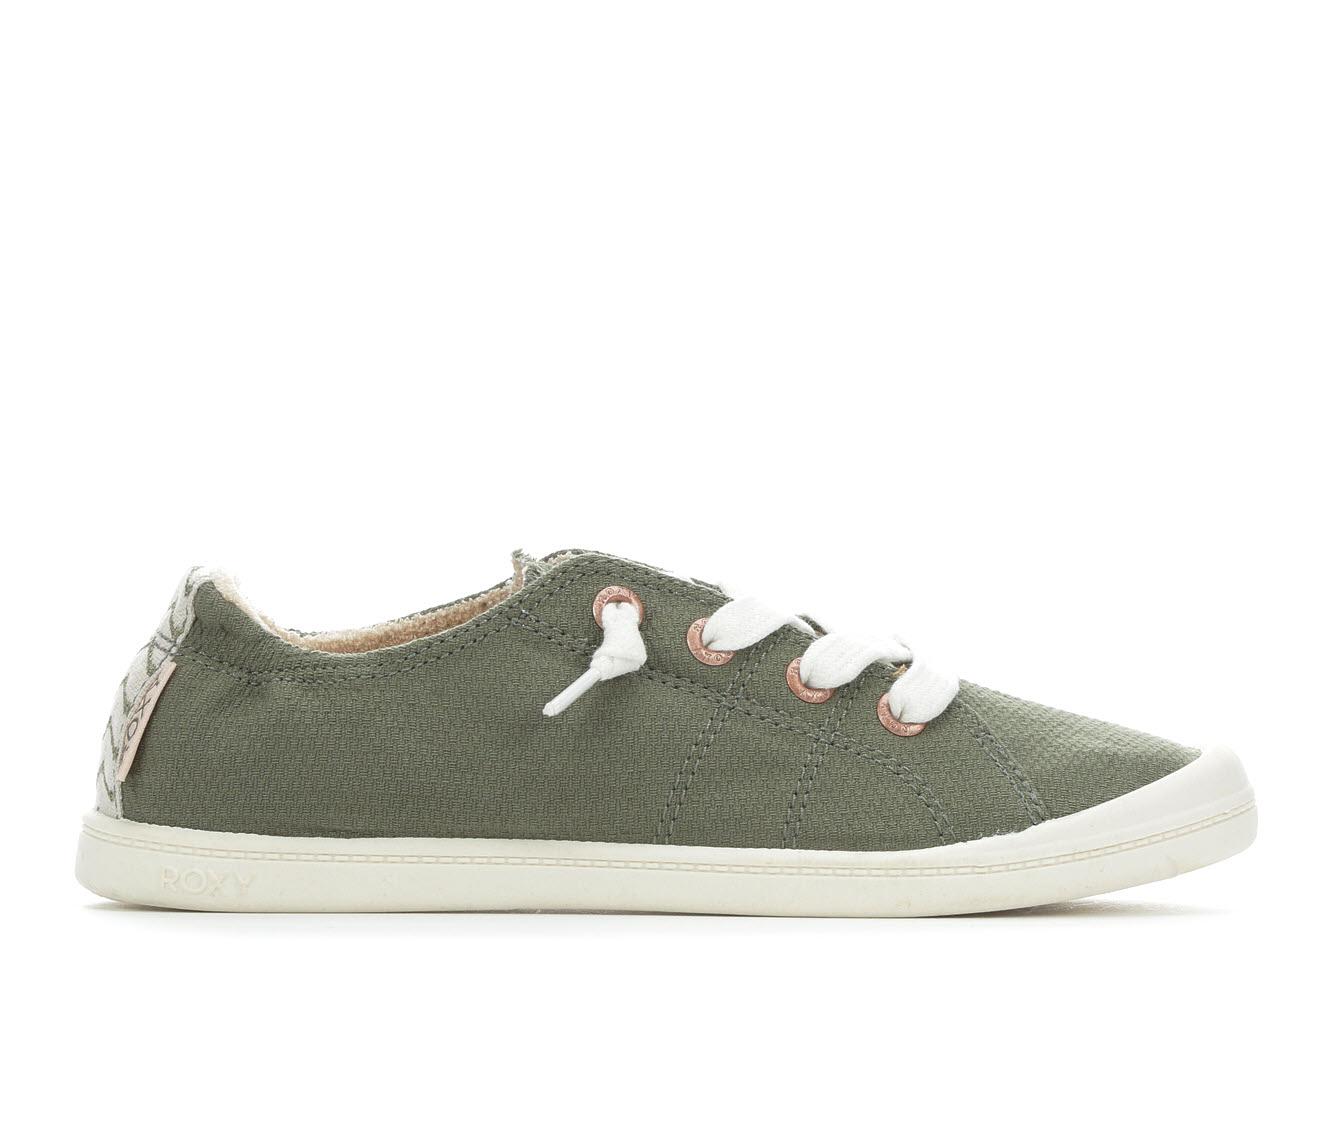 Roxy Bayshore Women's Shoe (Green Canvas)